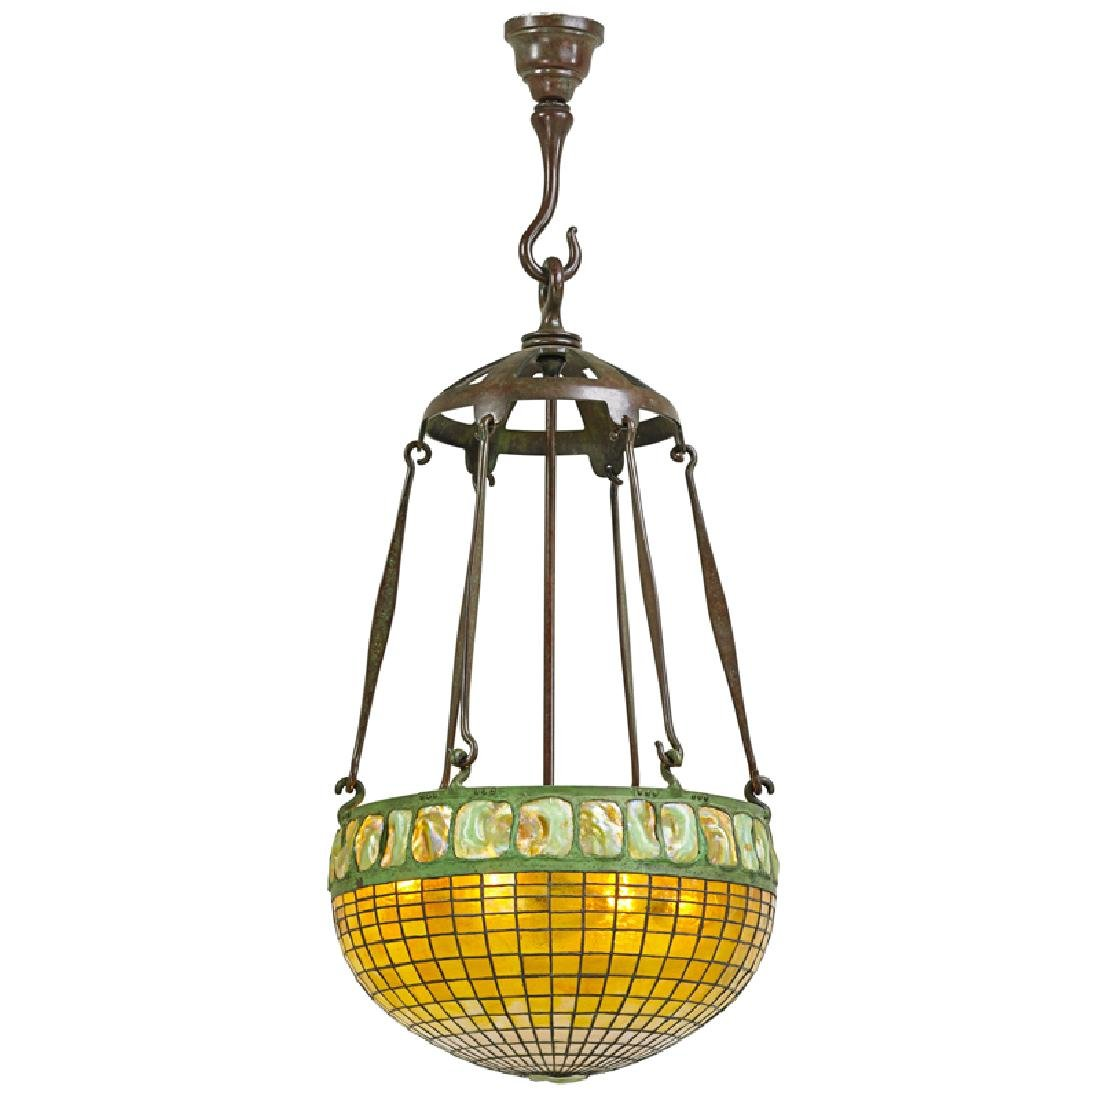 TIFFANY STUDIOS Large Turtleback chandelier